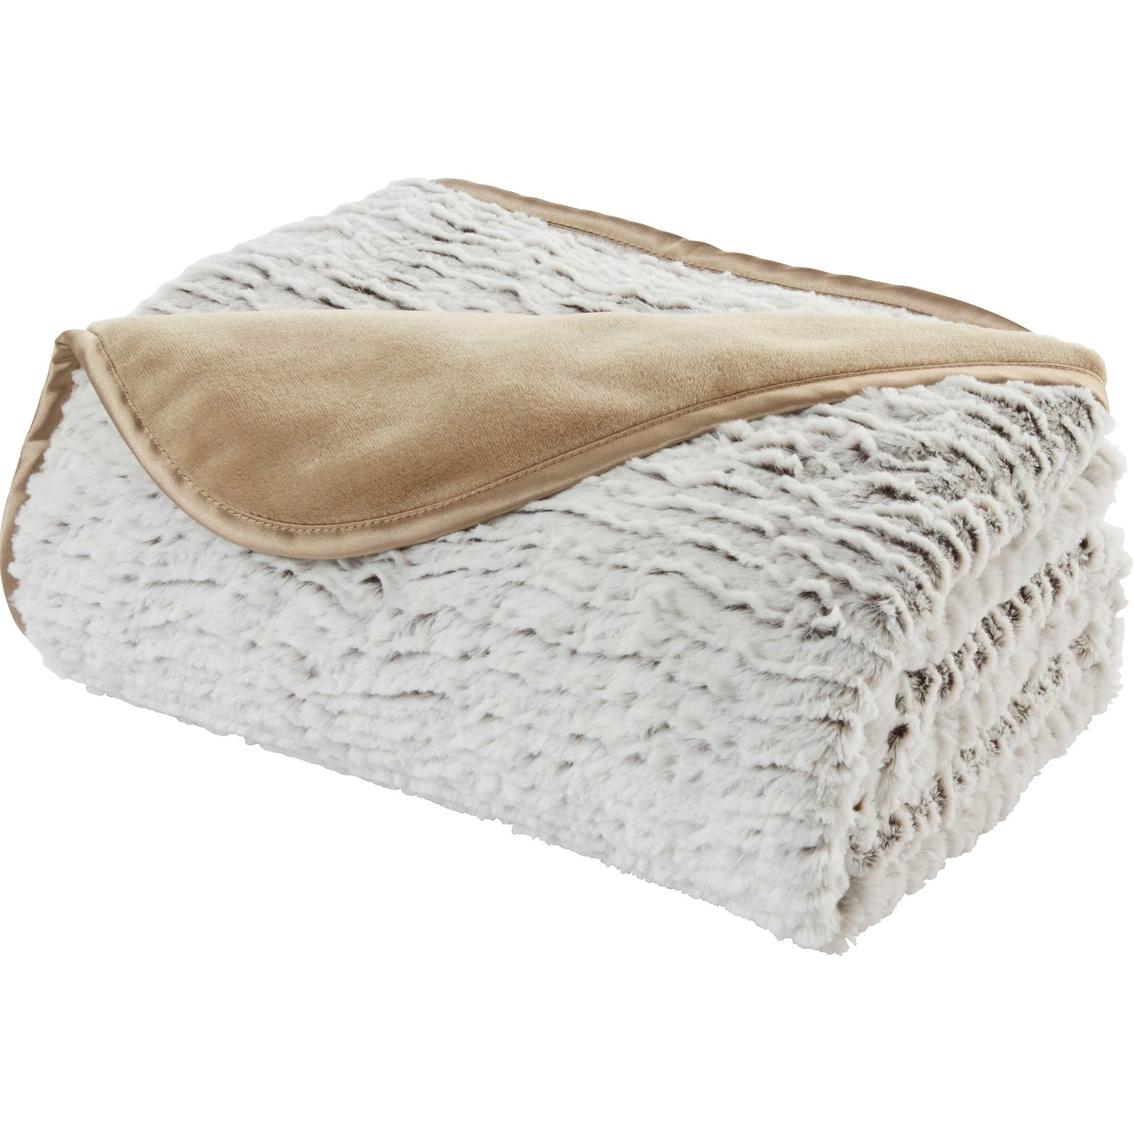 Brookstone Nap Ruffled Throw Non Electric Blankets